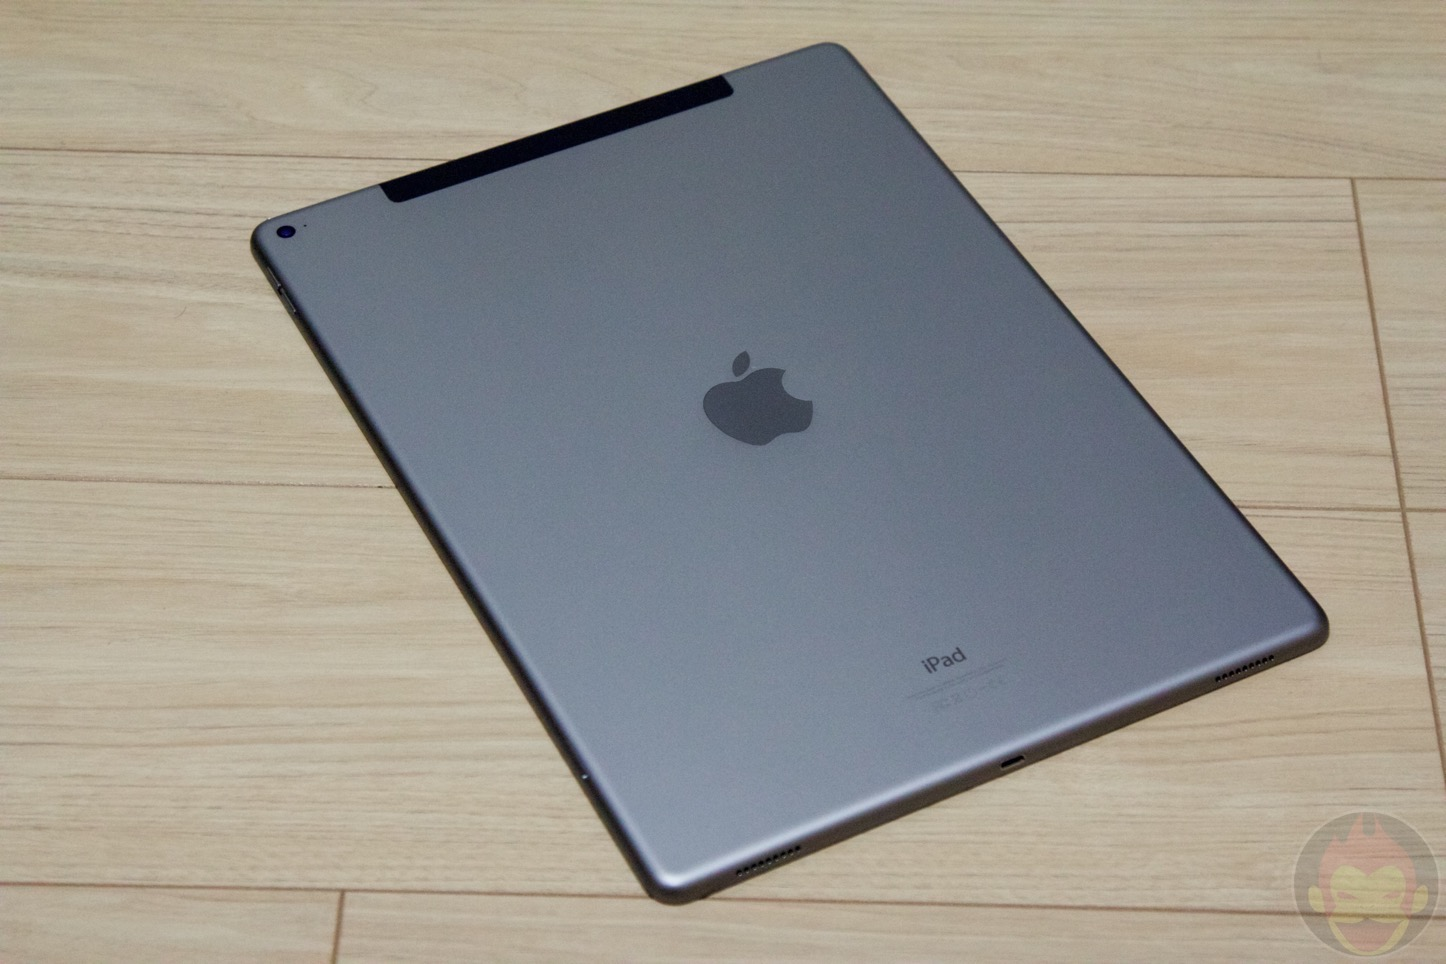 iPad-Pro-Unboxing-13.jpg